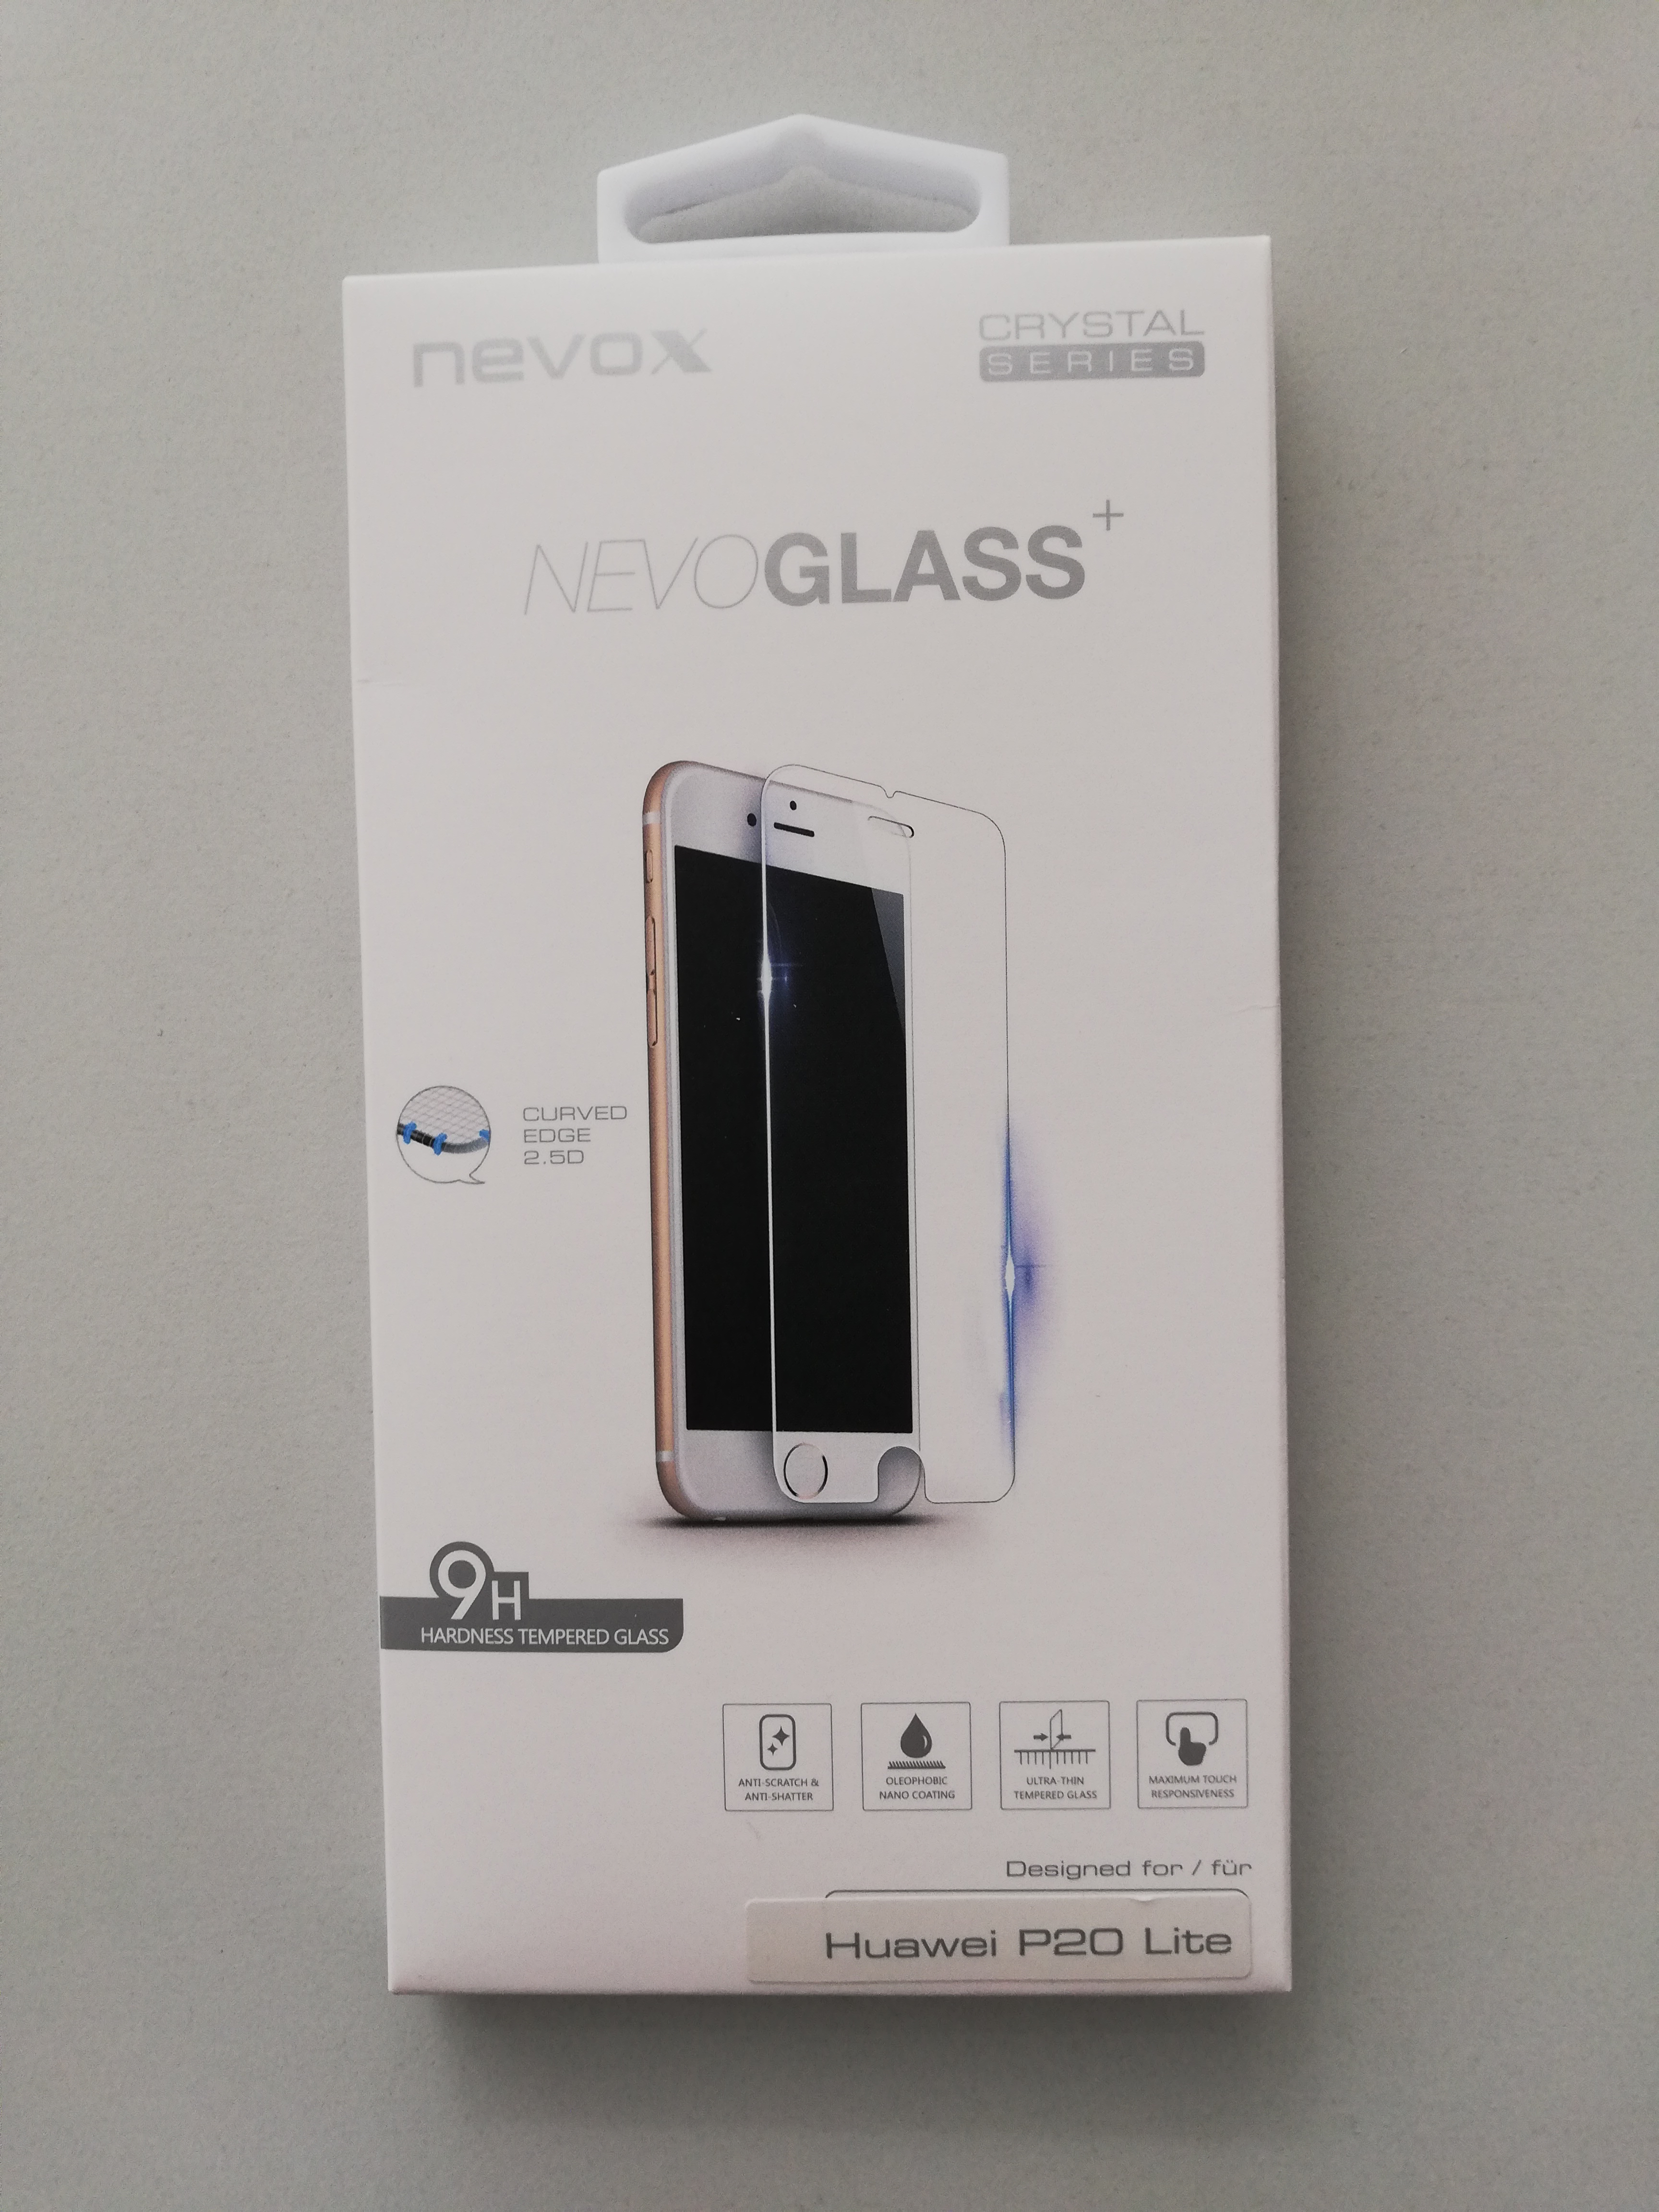 Nevoglass Huawei P20 Lite Tempered Glass